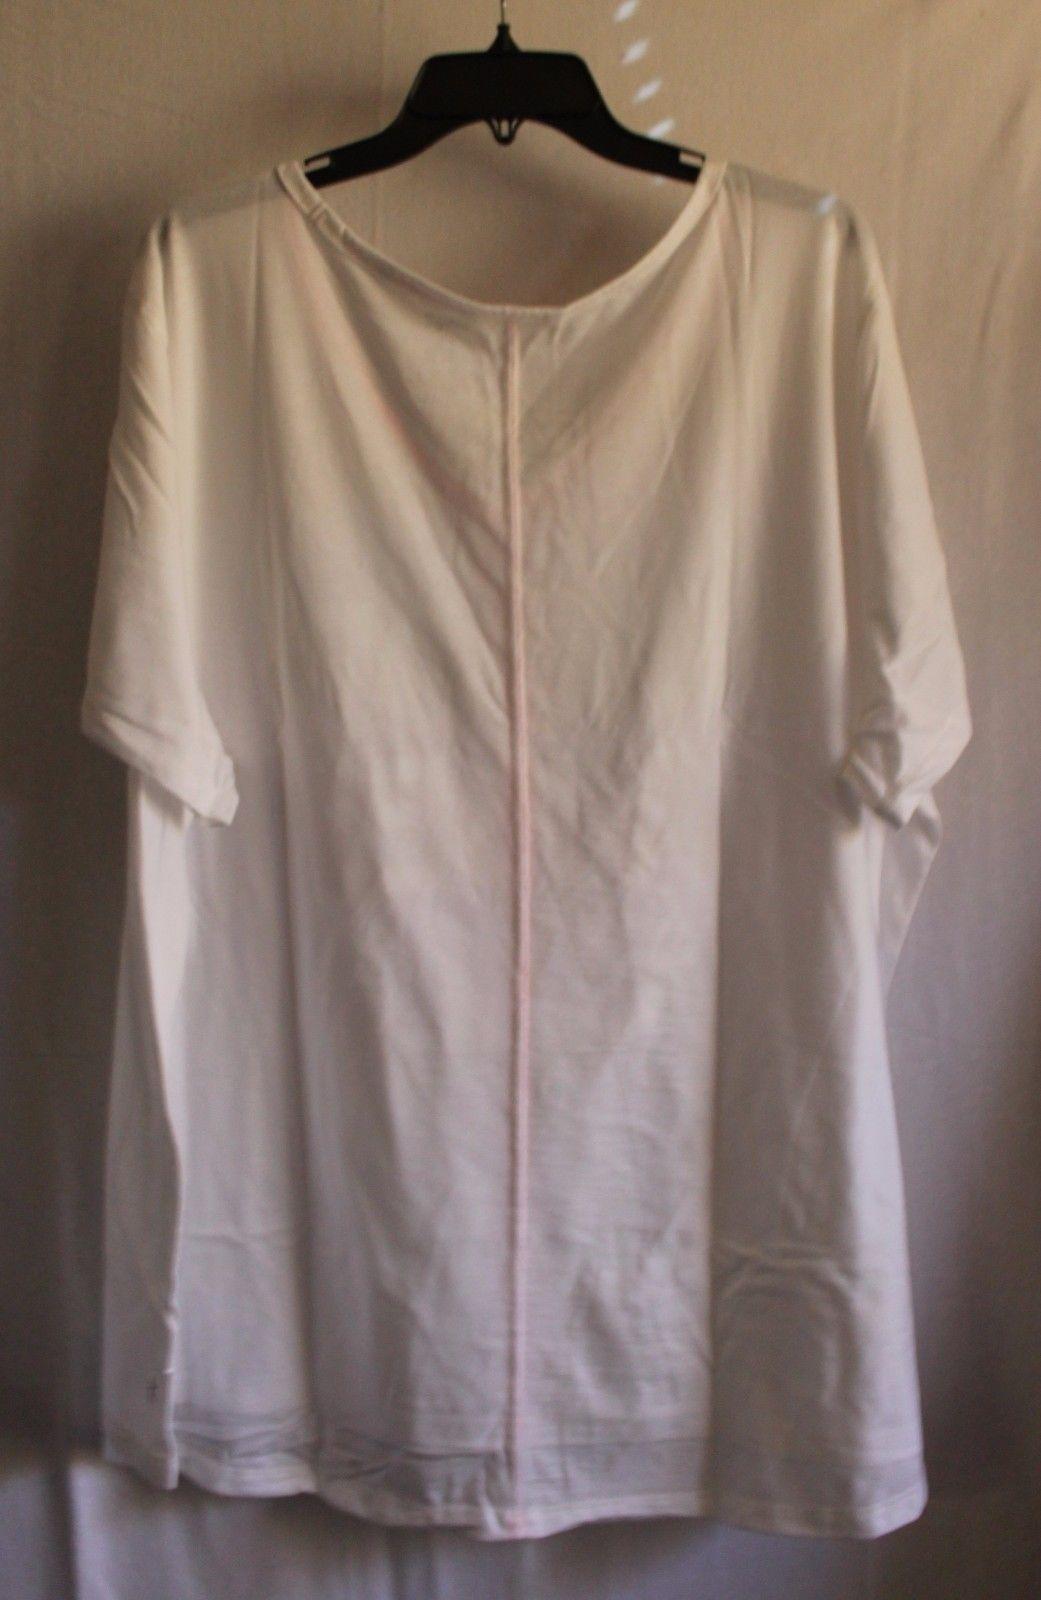 9f655f7e92653 New Danskin Womens Plus Size 4 X 28 W White and 50 similar items